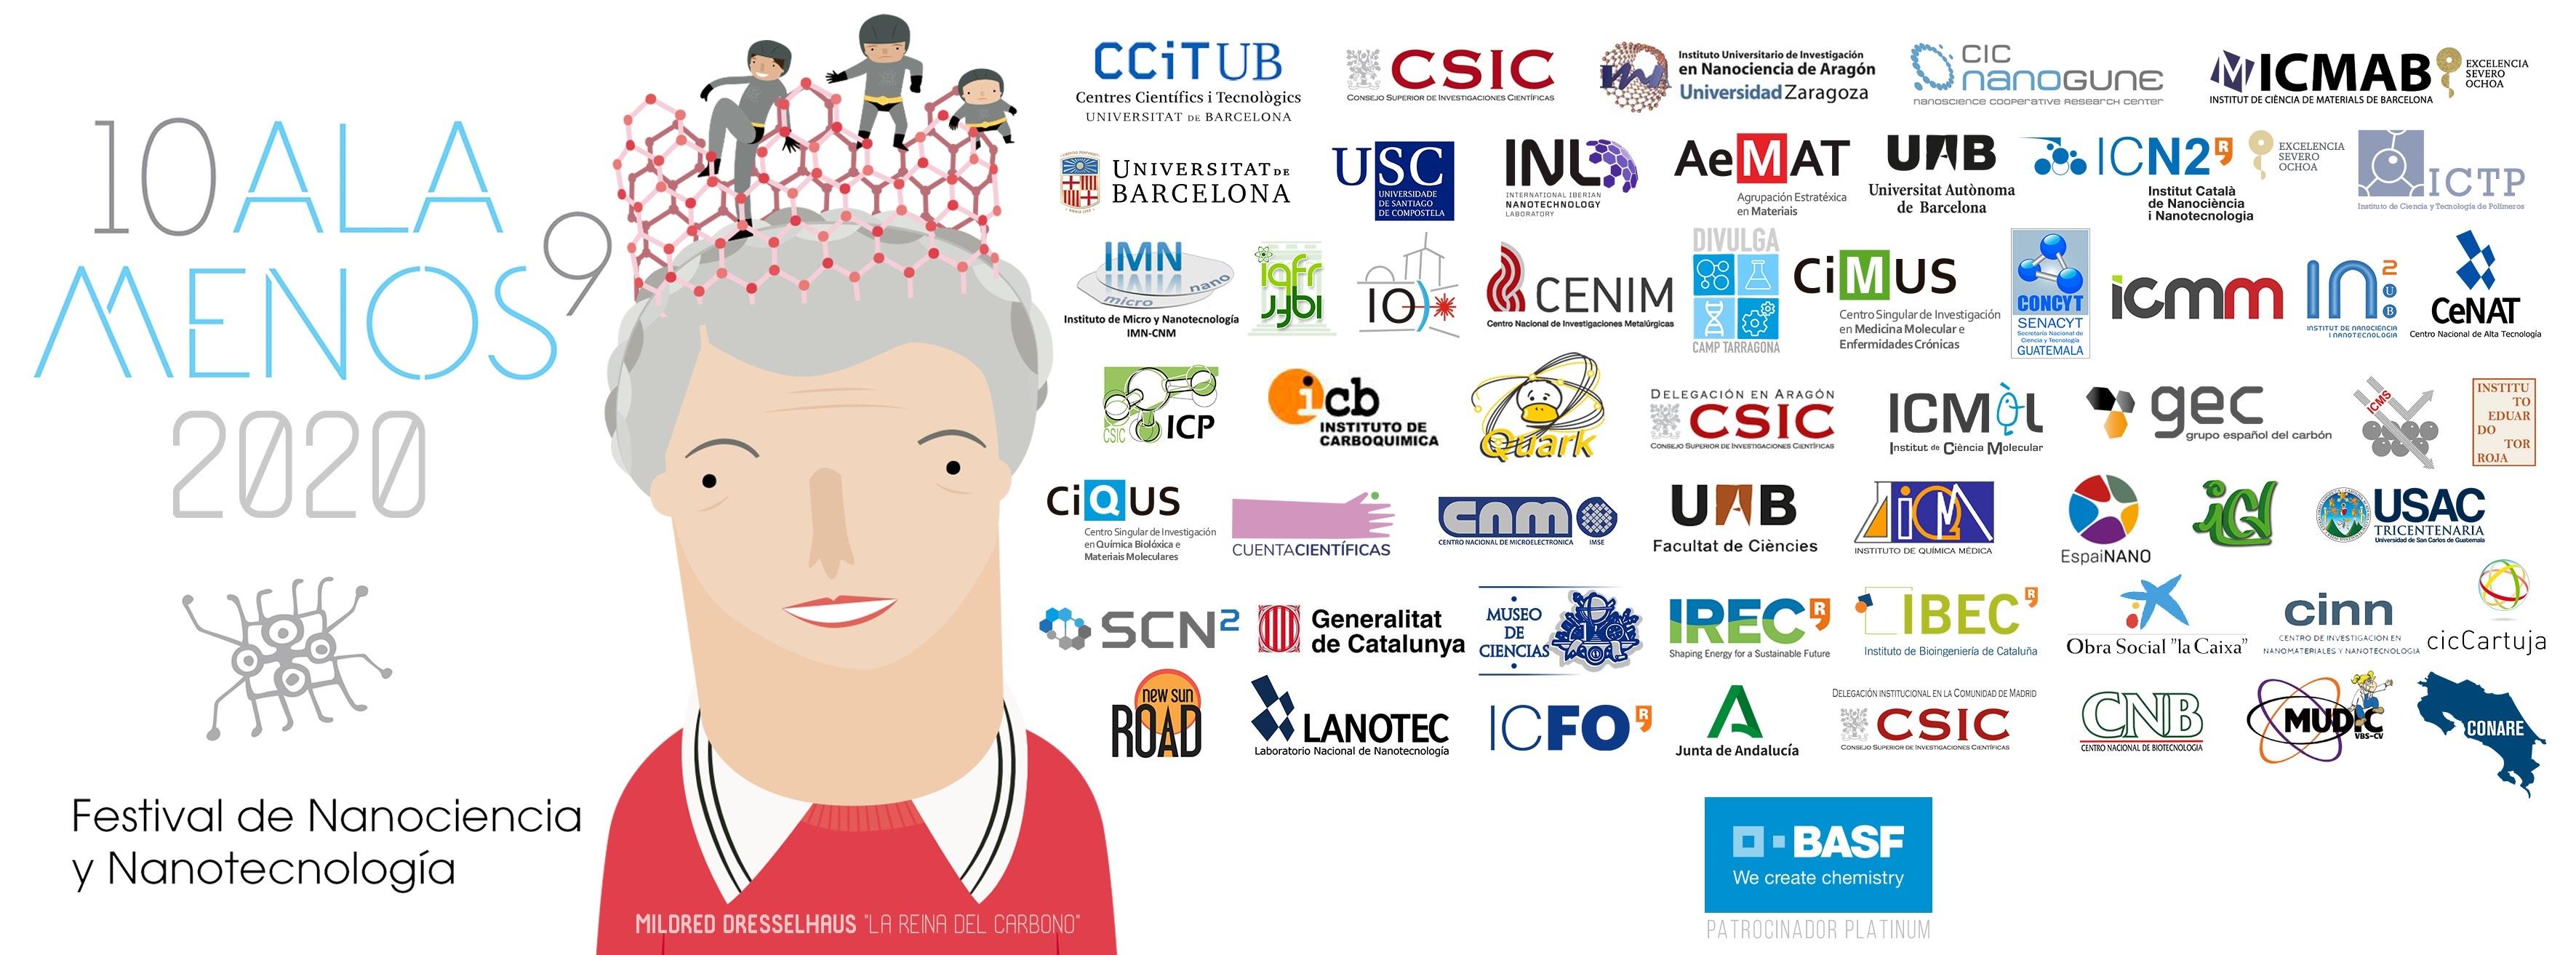 https://10alamenos9.es/wp-content/uploads/2020/03/10alamenos9-banner-20201-jpg.jpg